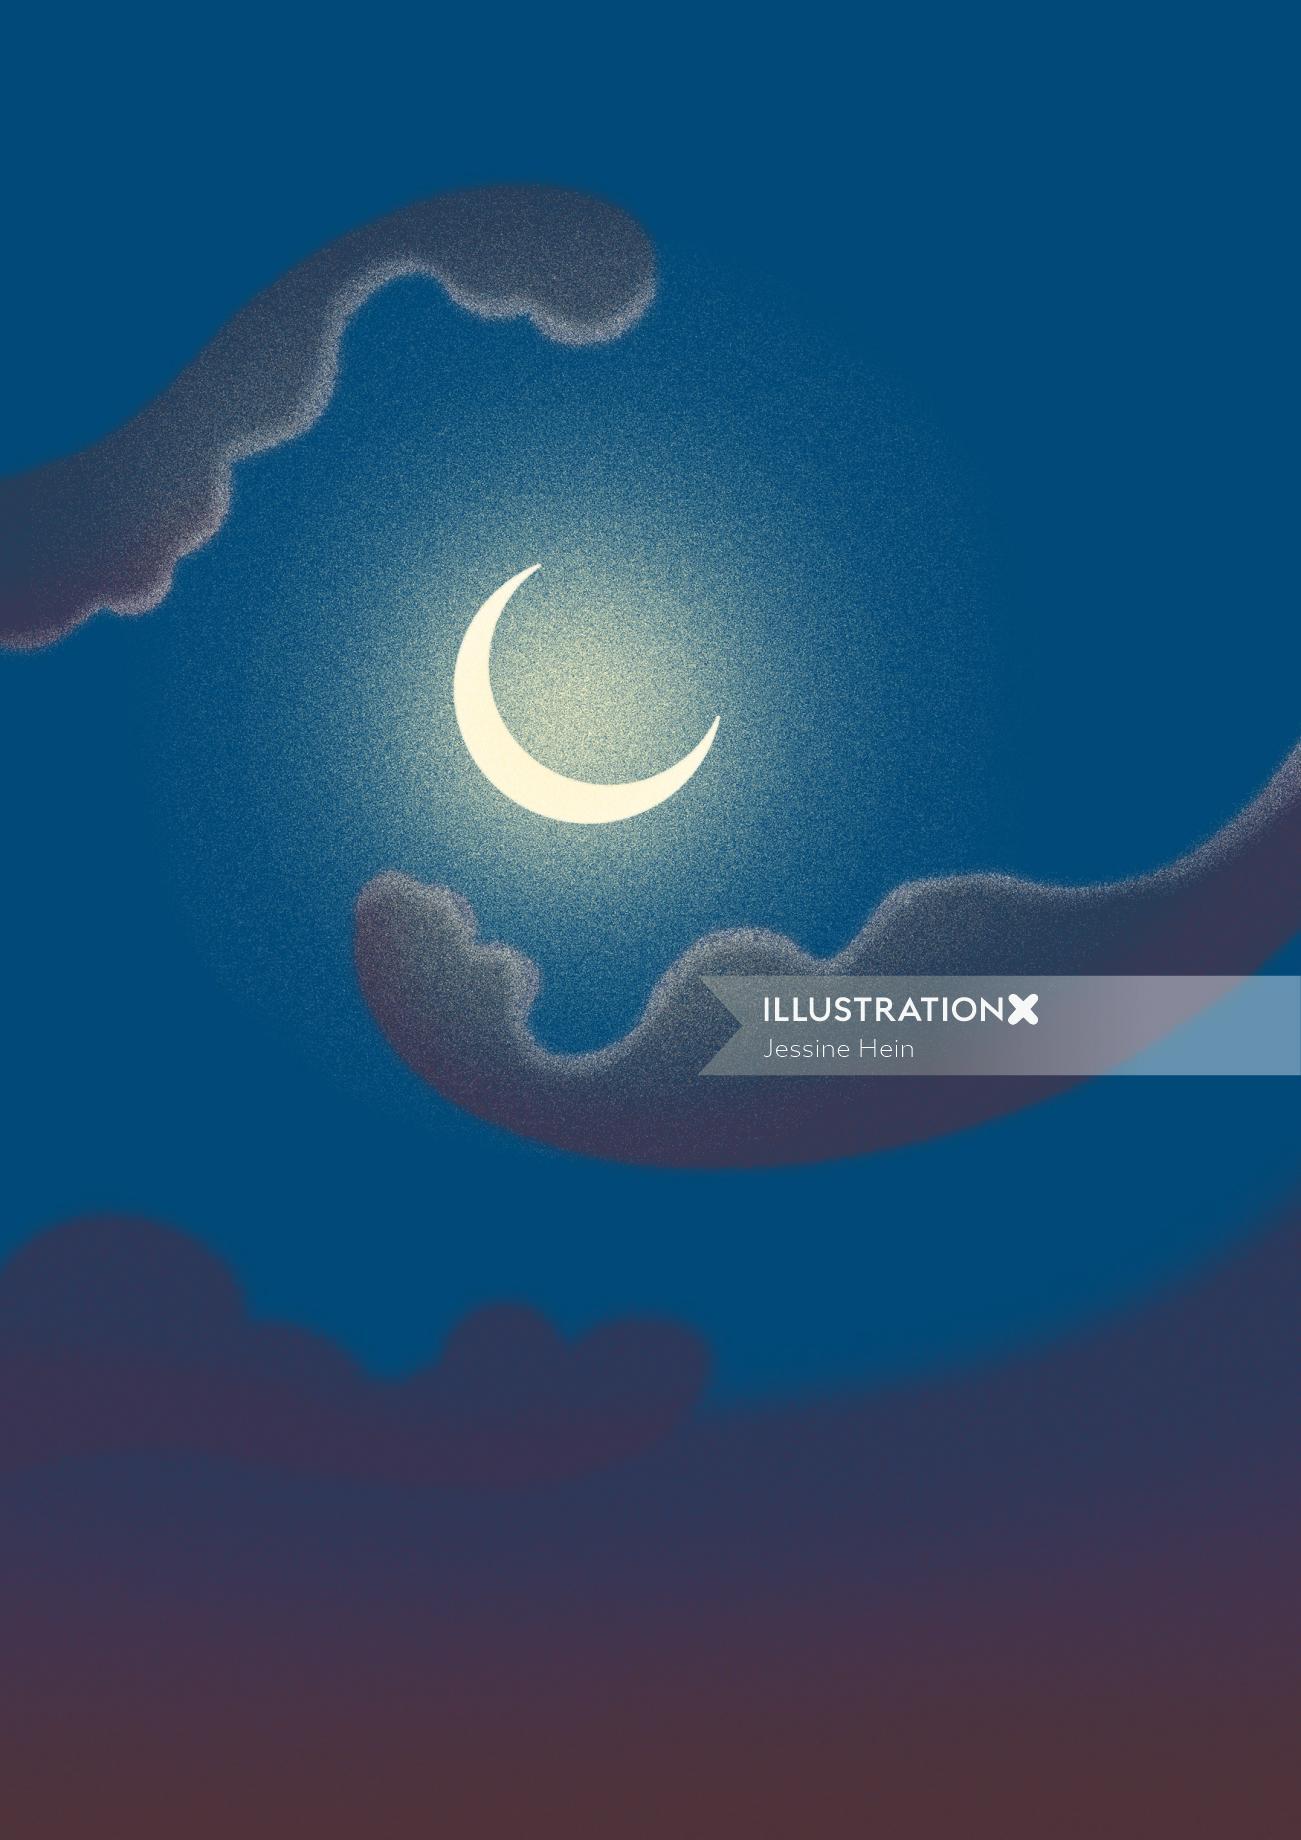 Graphic design of moon light